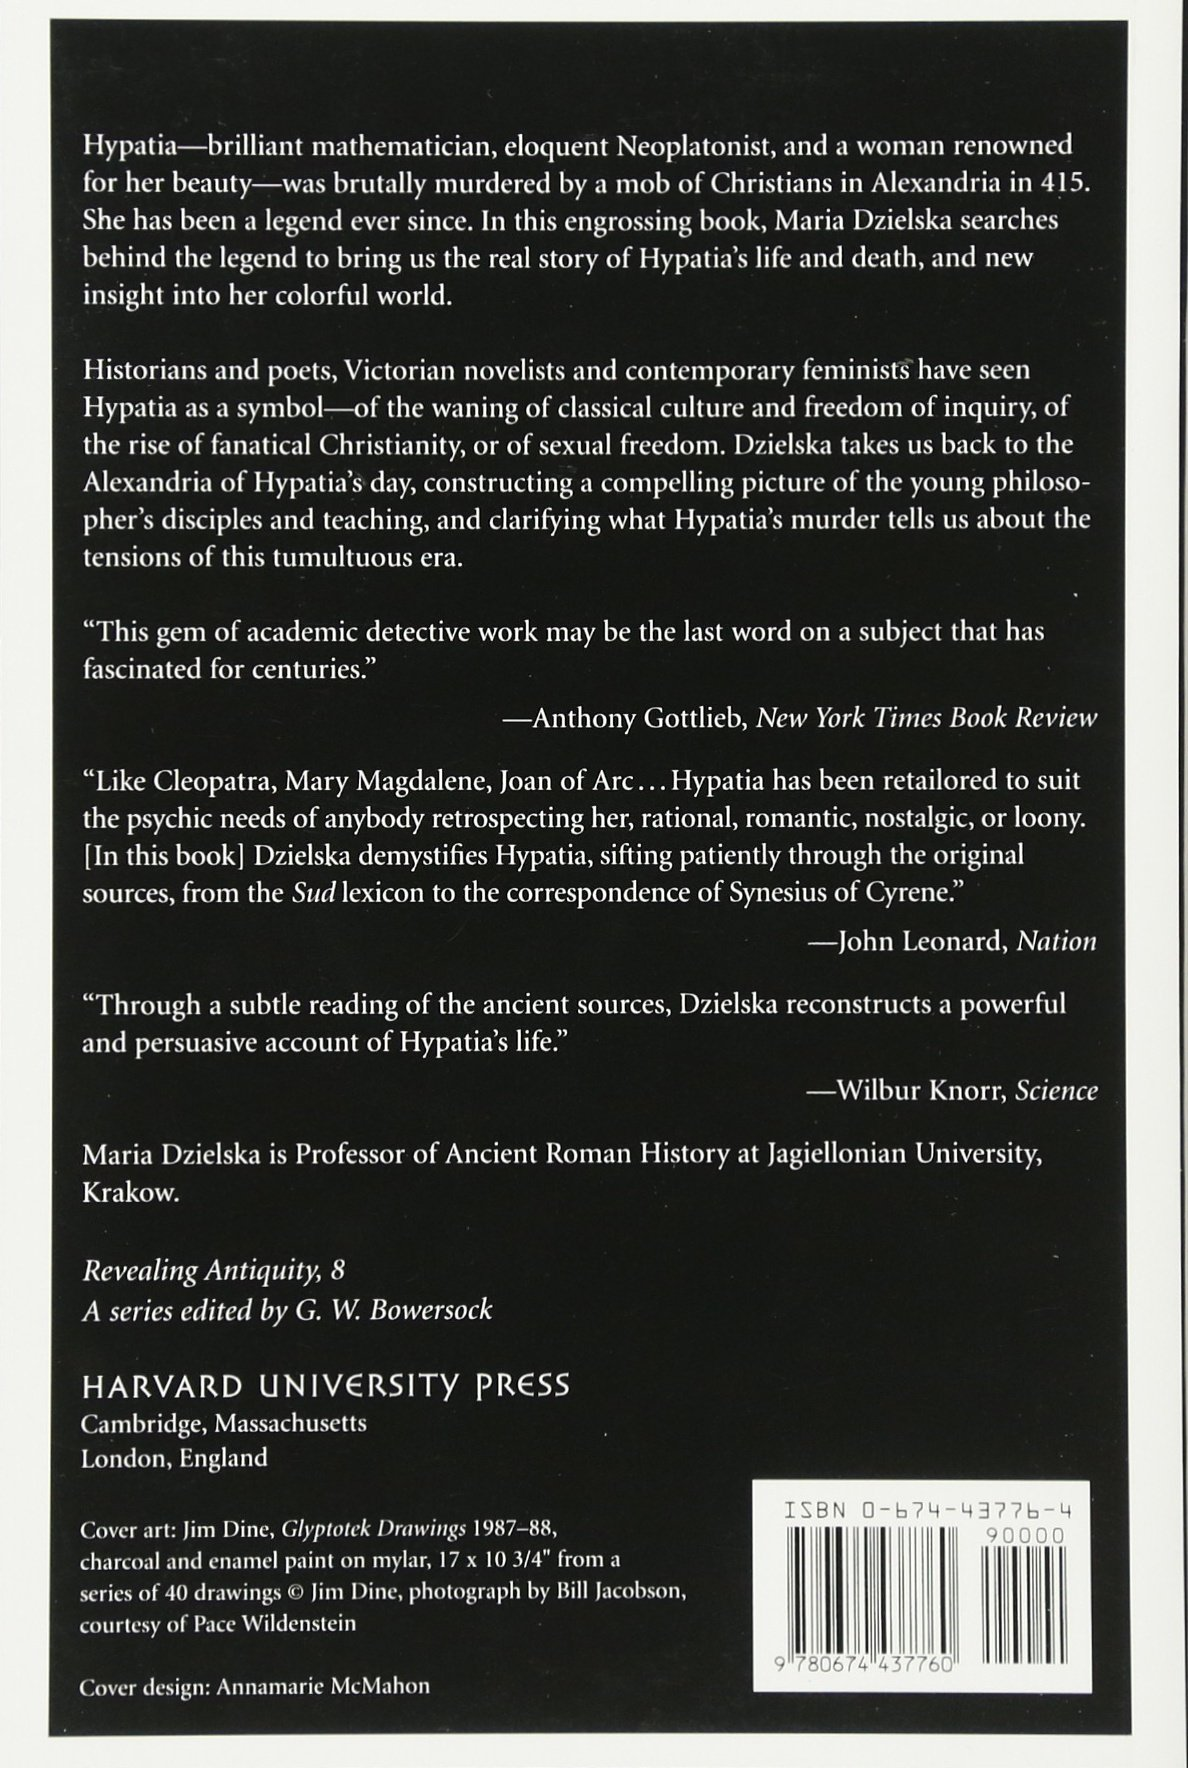 Hypatia of Alexandria (Paper) (Revealing Antiquity): Amazon.es: Maria Dzielska: Libros en idiomas extranjeros